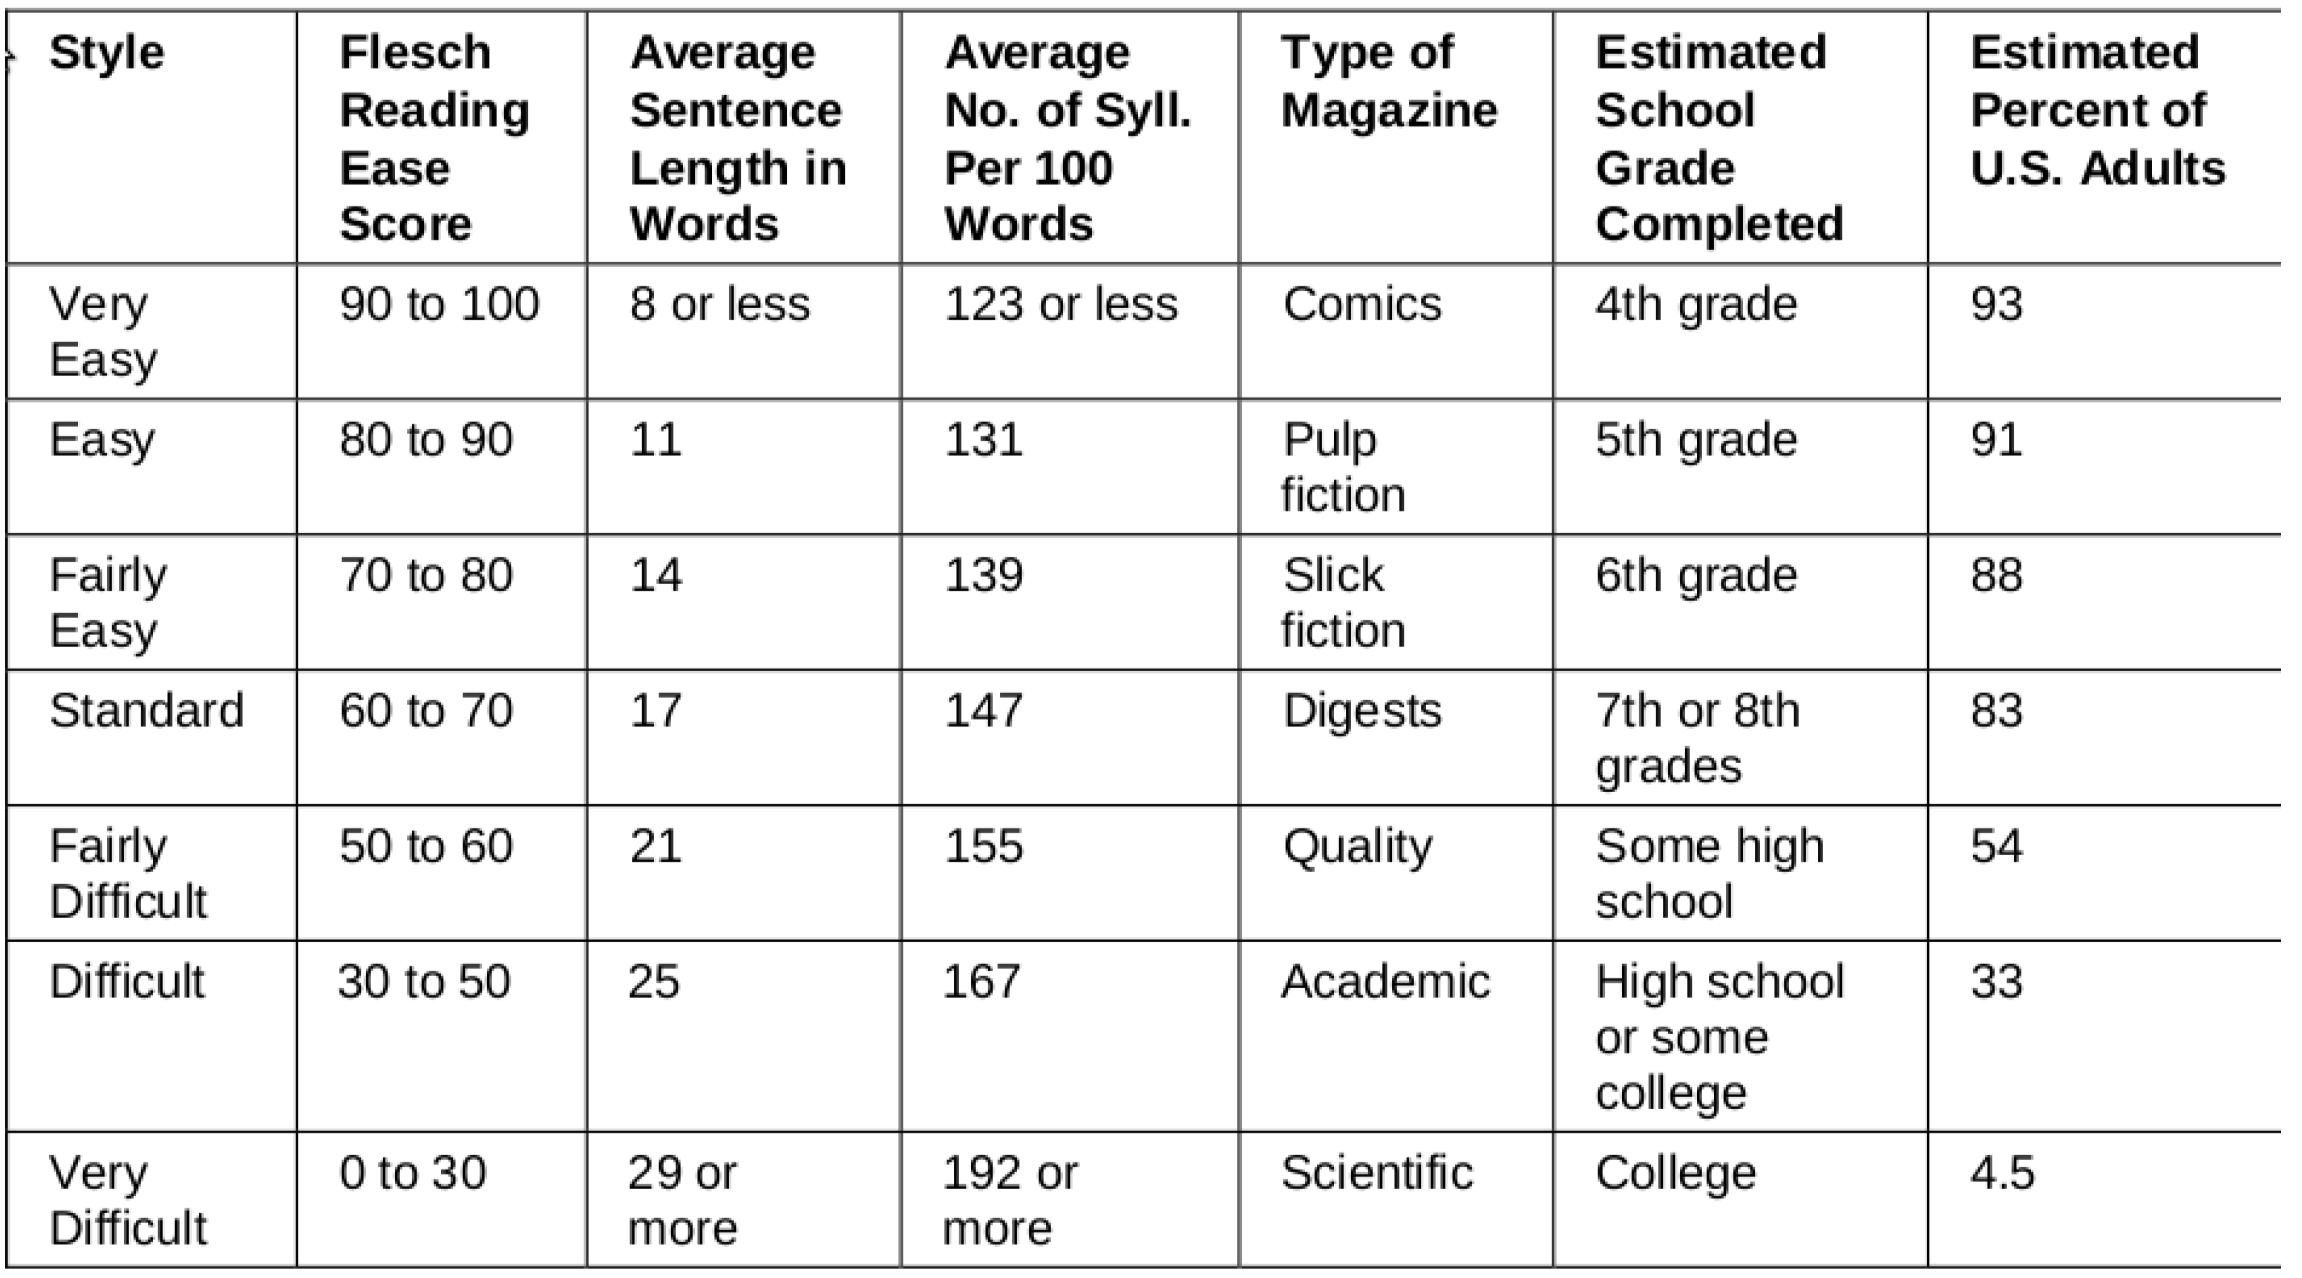 Results: Flesch-Kincaid Readability Index